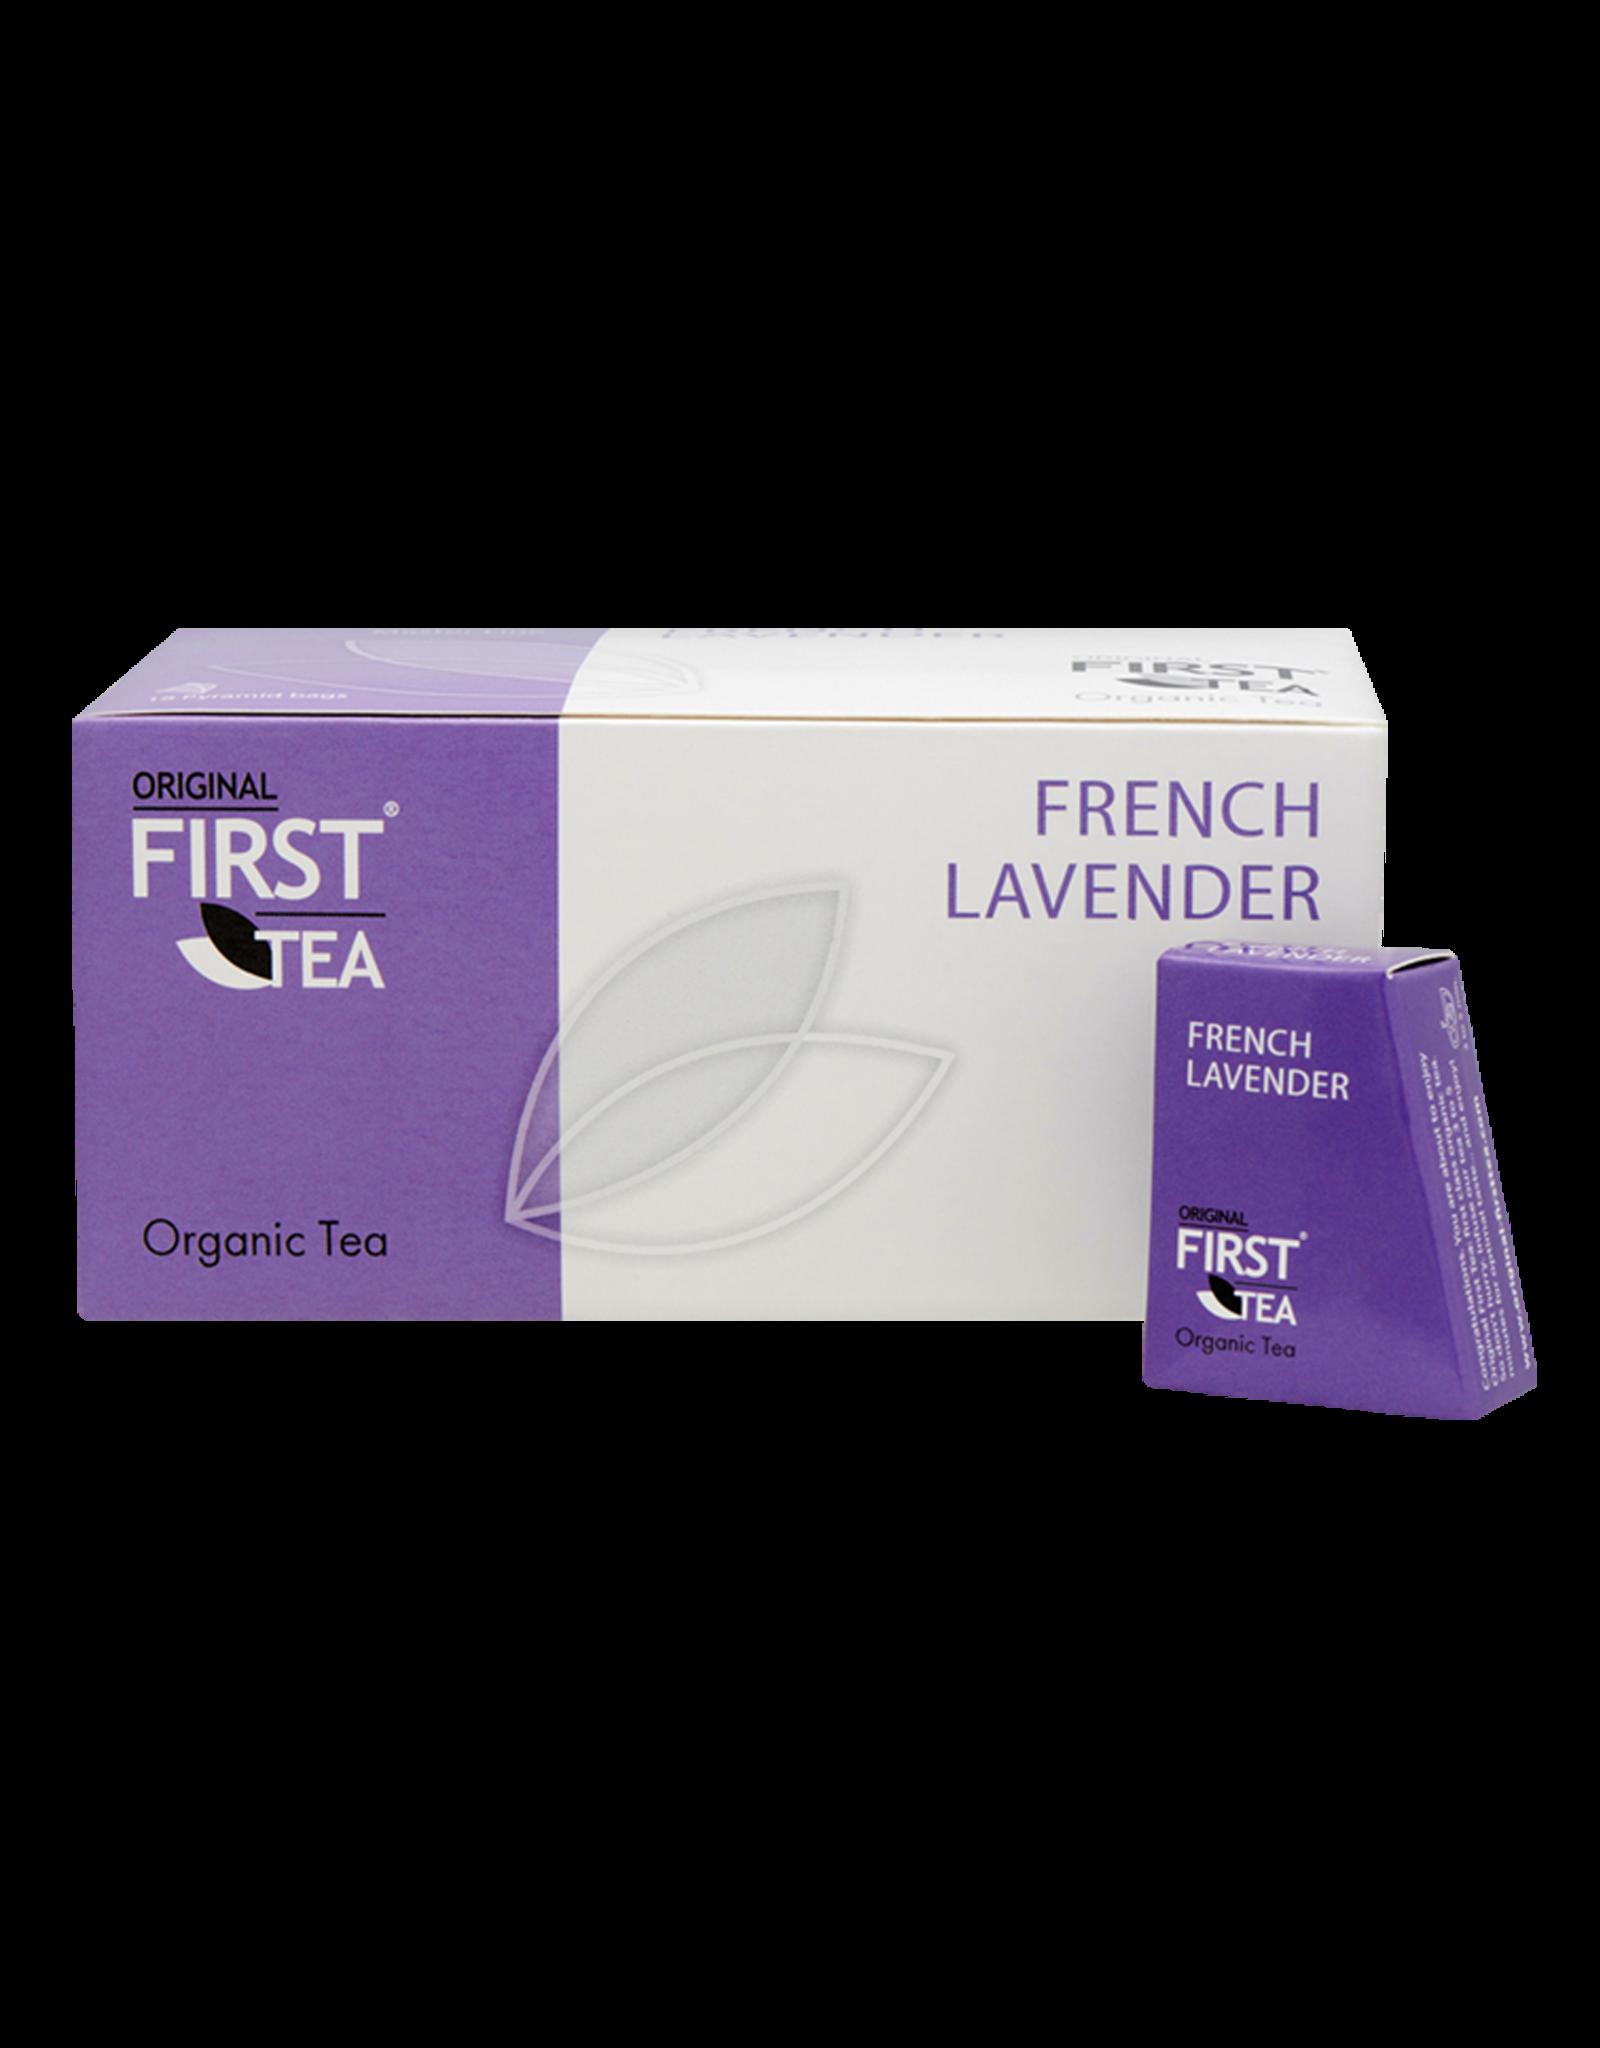 First Tea Master line Masterline French Lavender